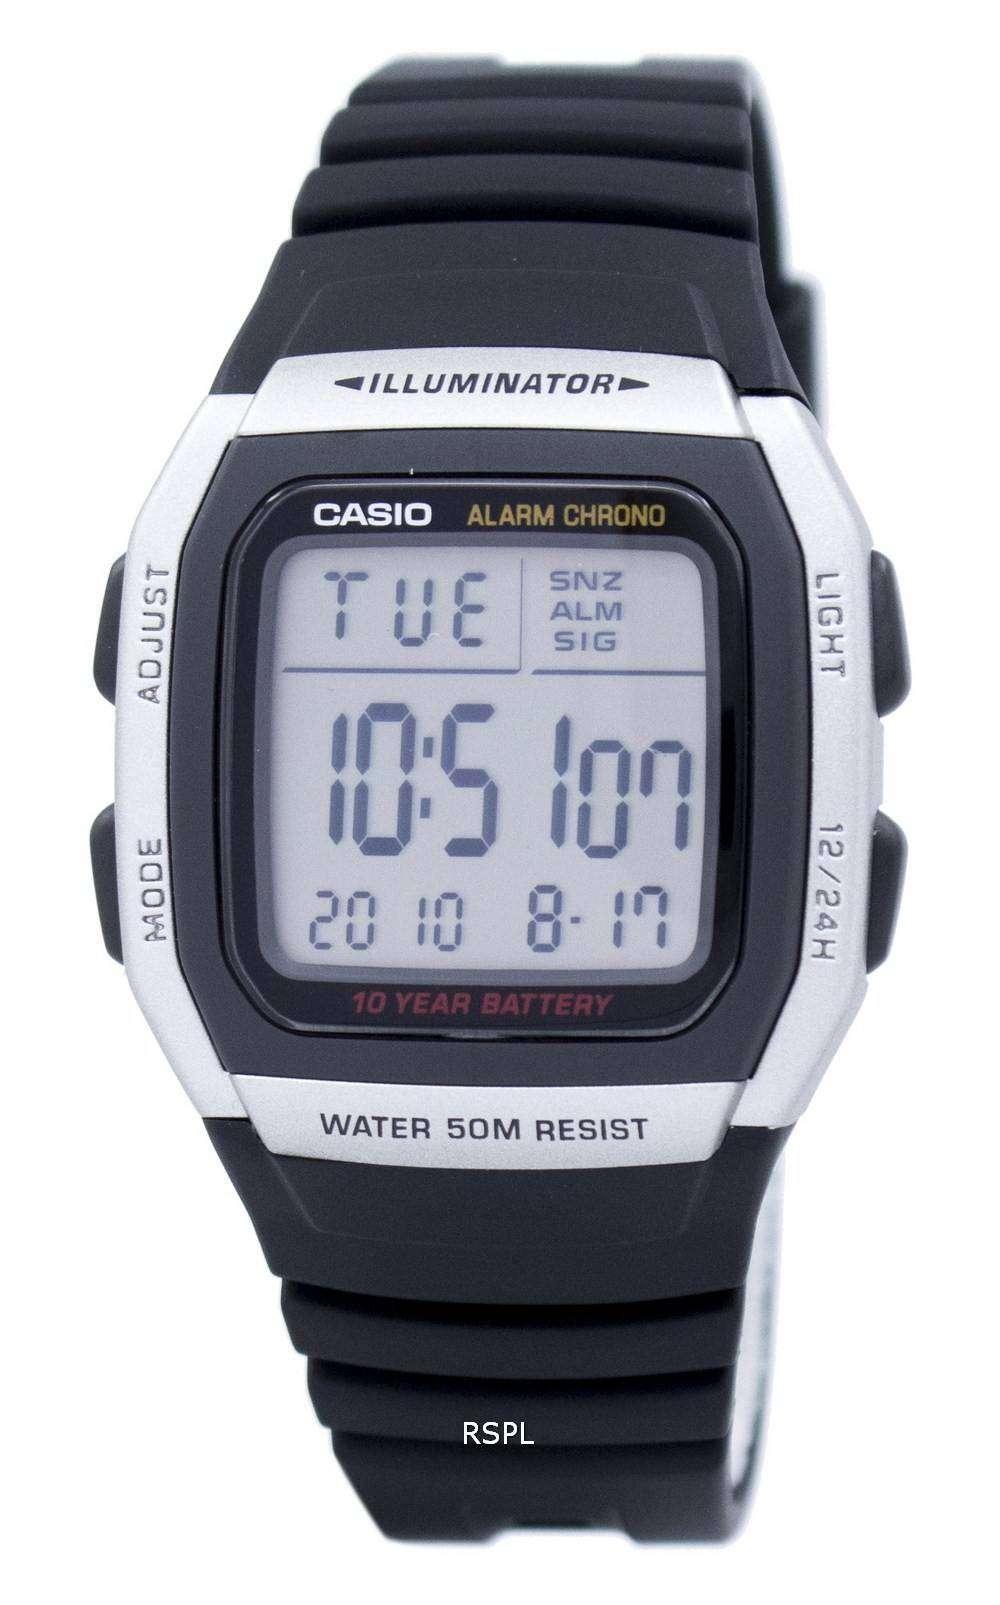 52a6ecd0cdf5 Reloj juvenil Casio Digital alarma Chrono iluminador W-96H-1AVDF W-96H-